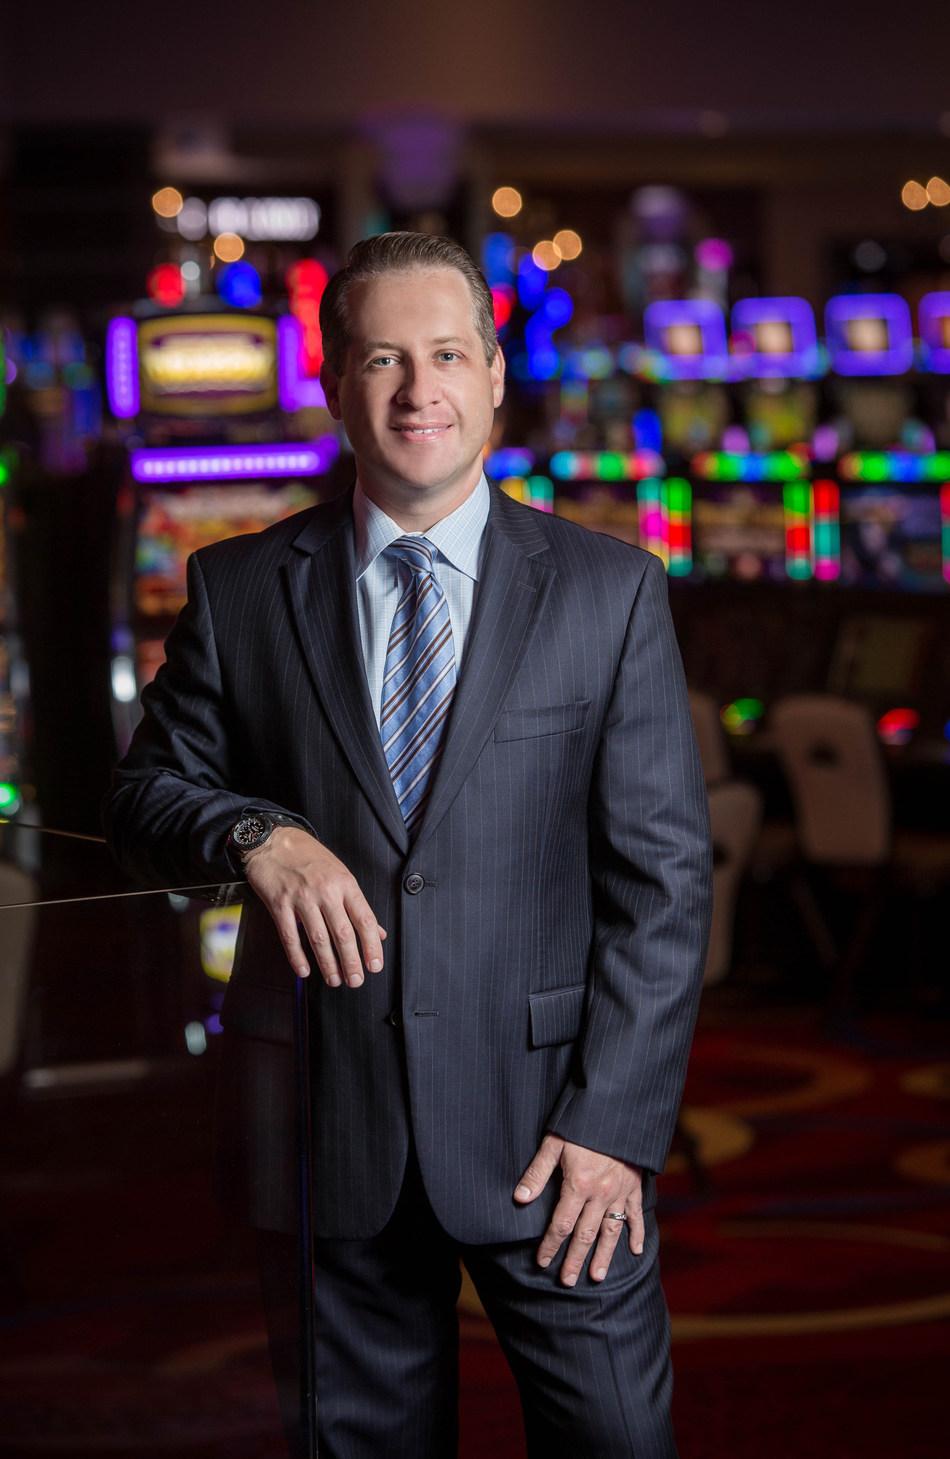 Hard Rock International Names Mark Birtha President of Hard Rock Hotel & Casino Sacramento at Fire Mountain